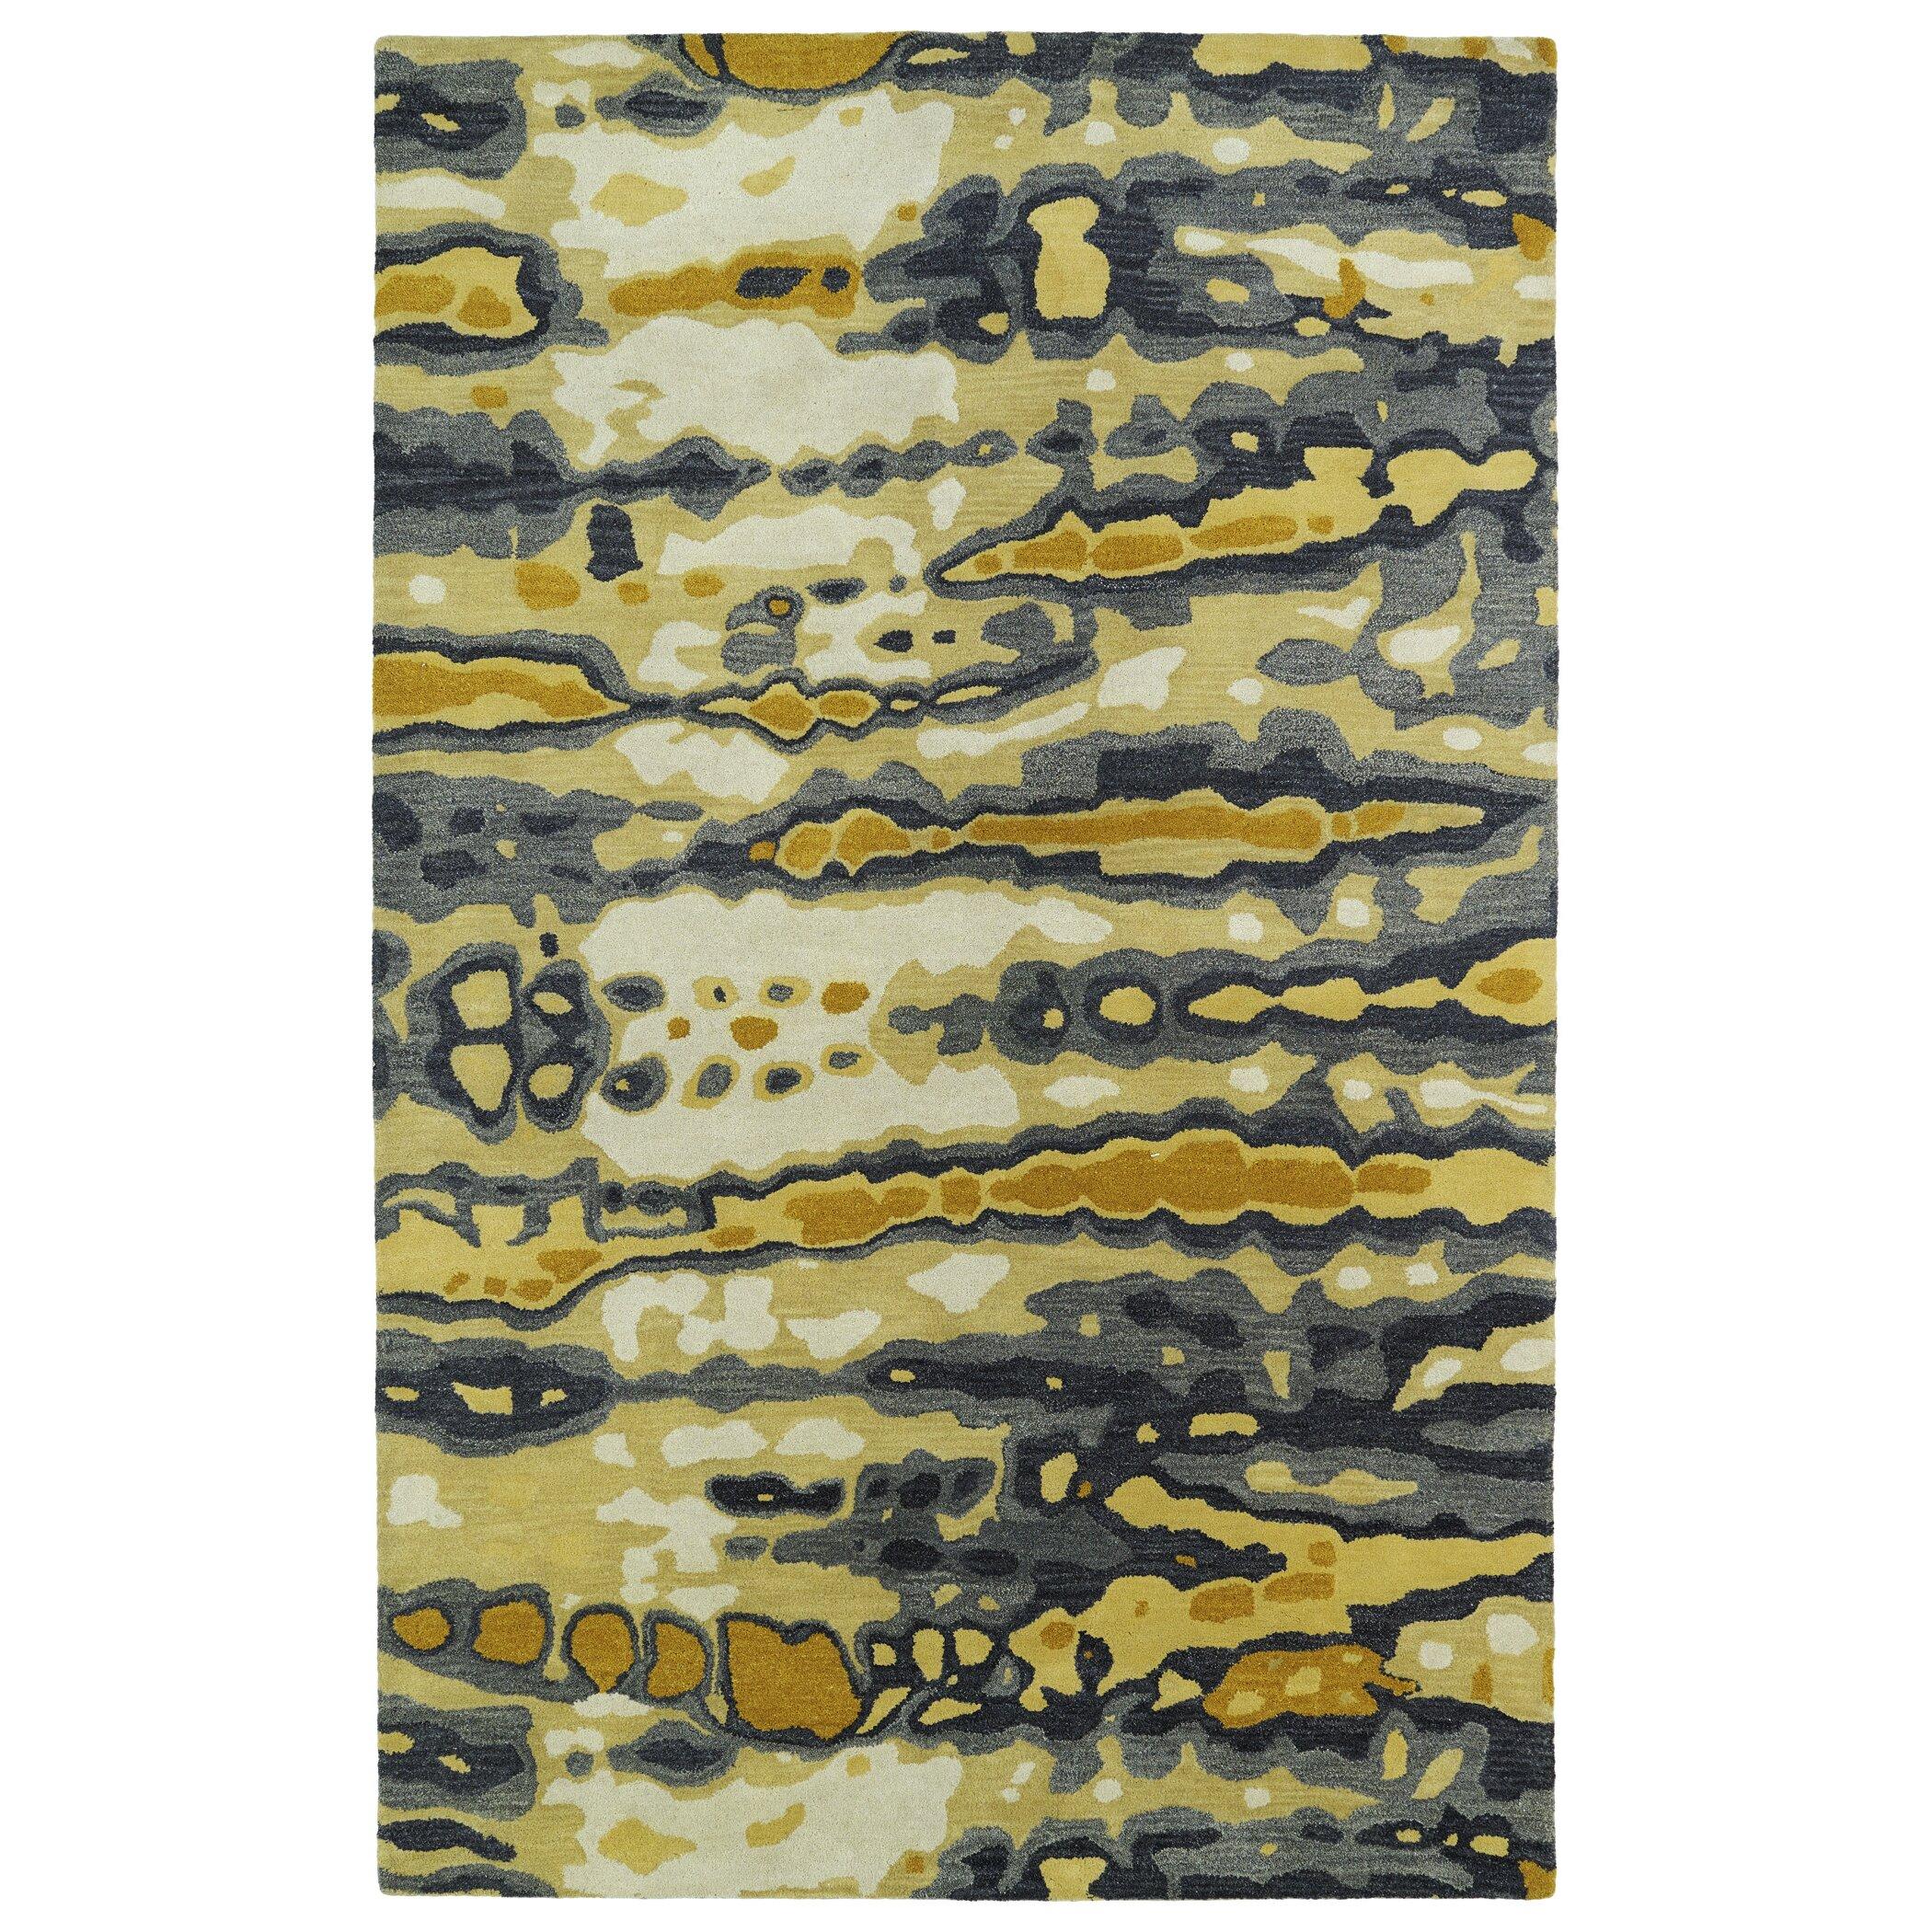 8 Apsley Place Kaleen Kaleen Brushstrokes Gold Gray Area Rug Brs